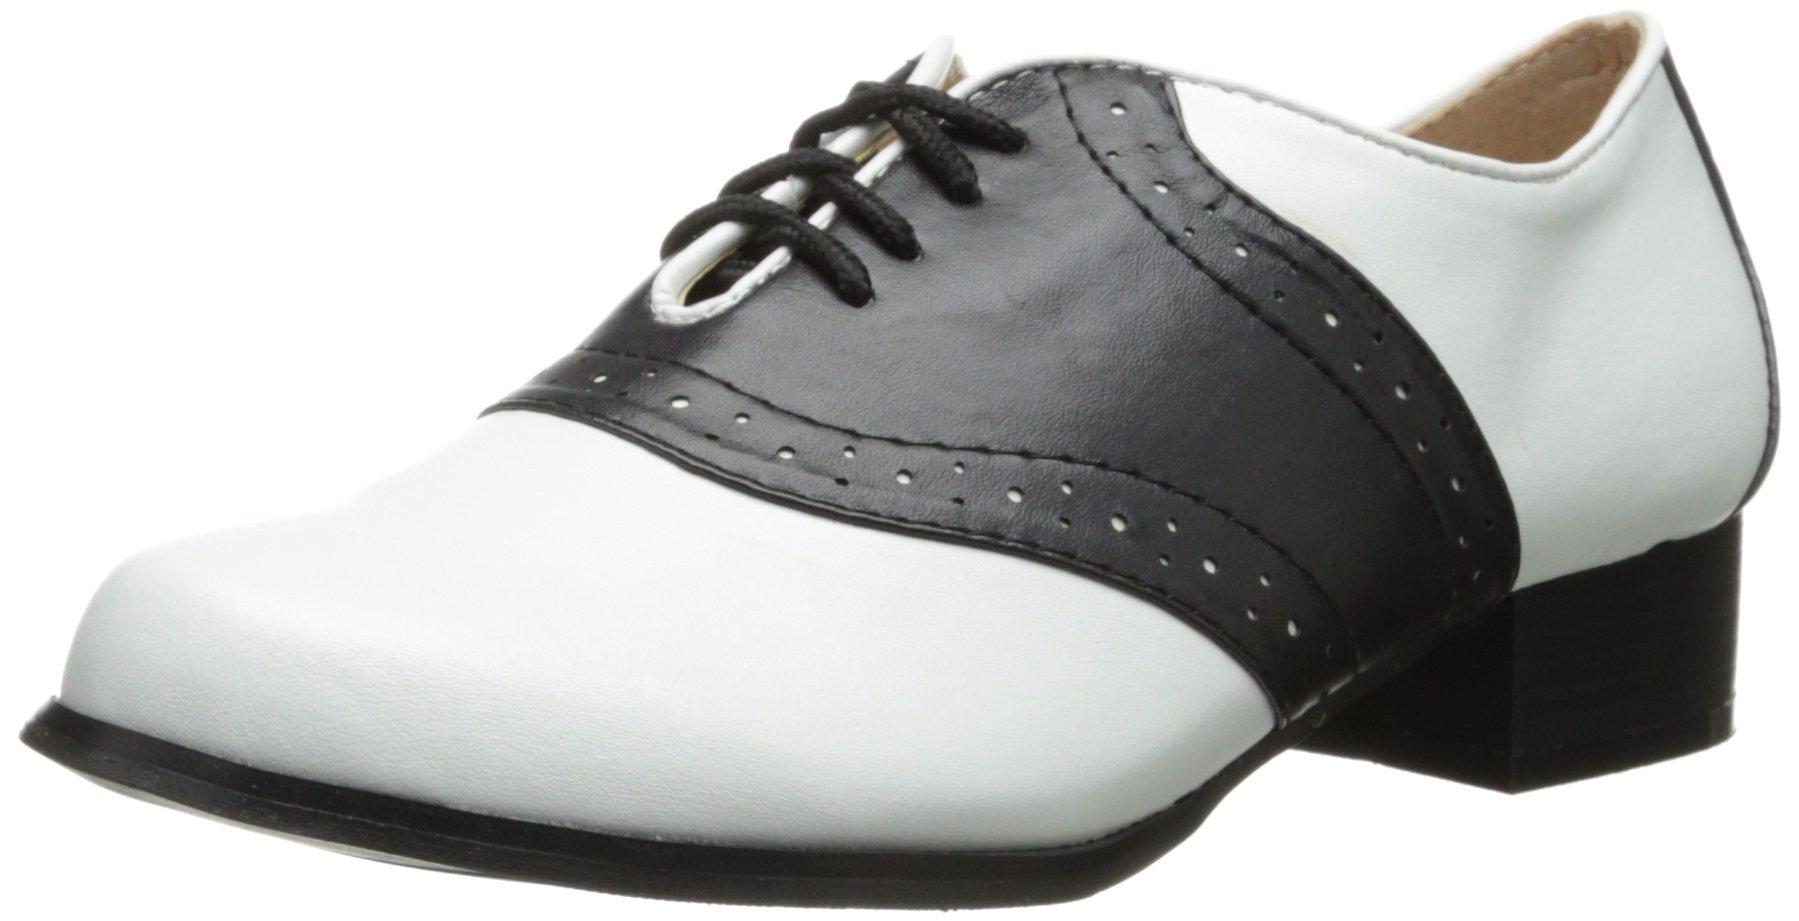 Ellie Shoes Women's 105-saddle, Black/White, 8 M US